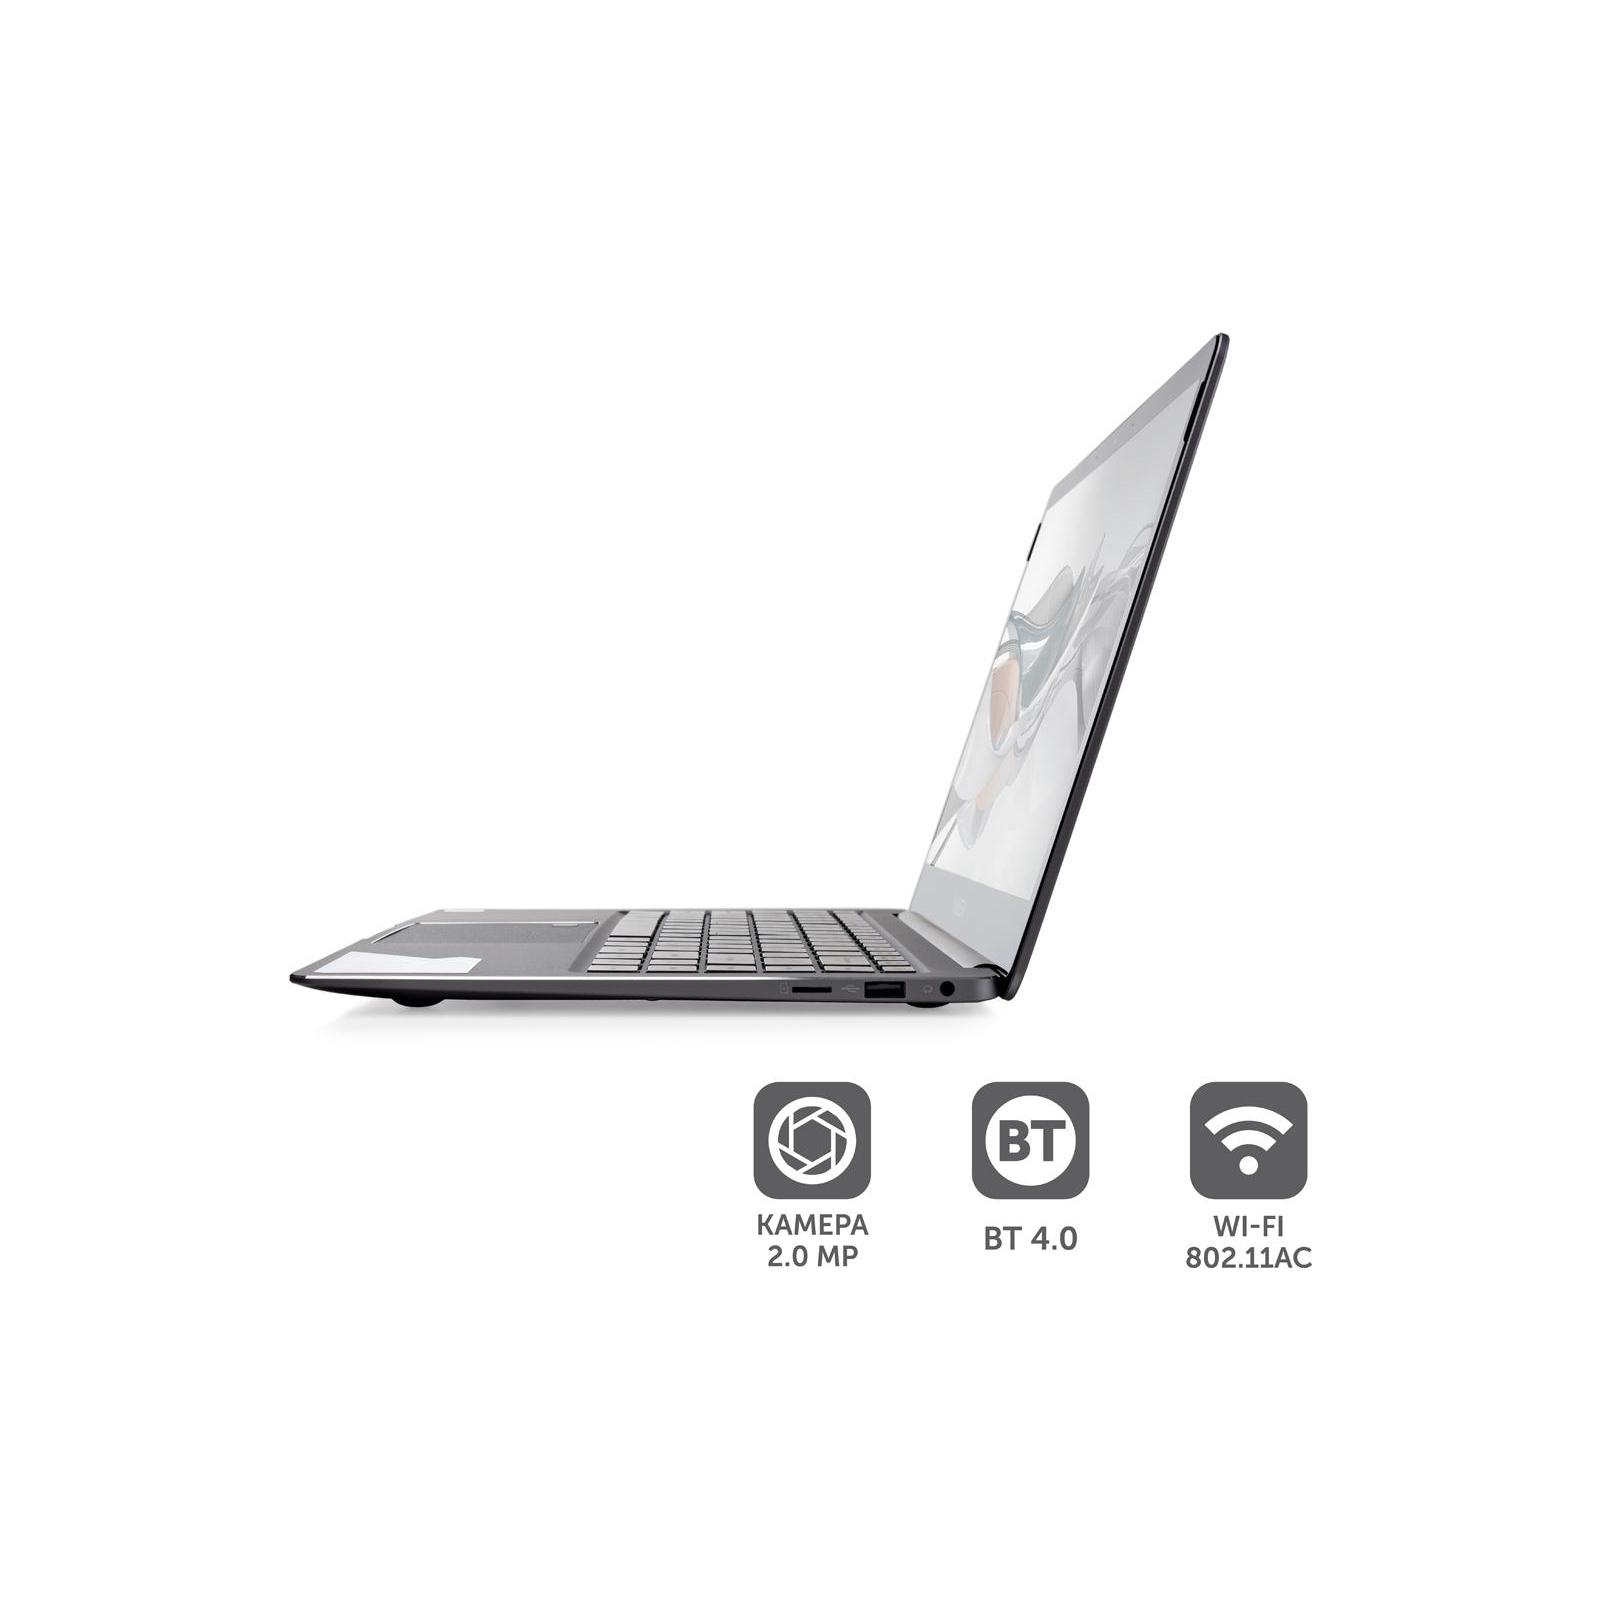 Ноутбук Vinga Iron S140 (S140-P50464G) изображение 4